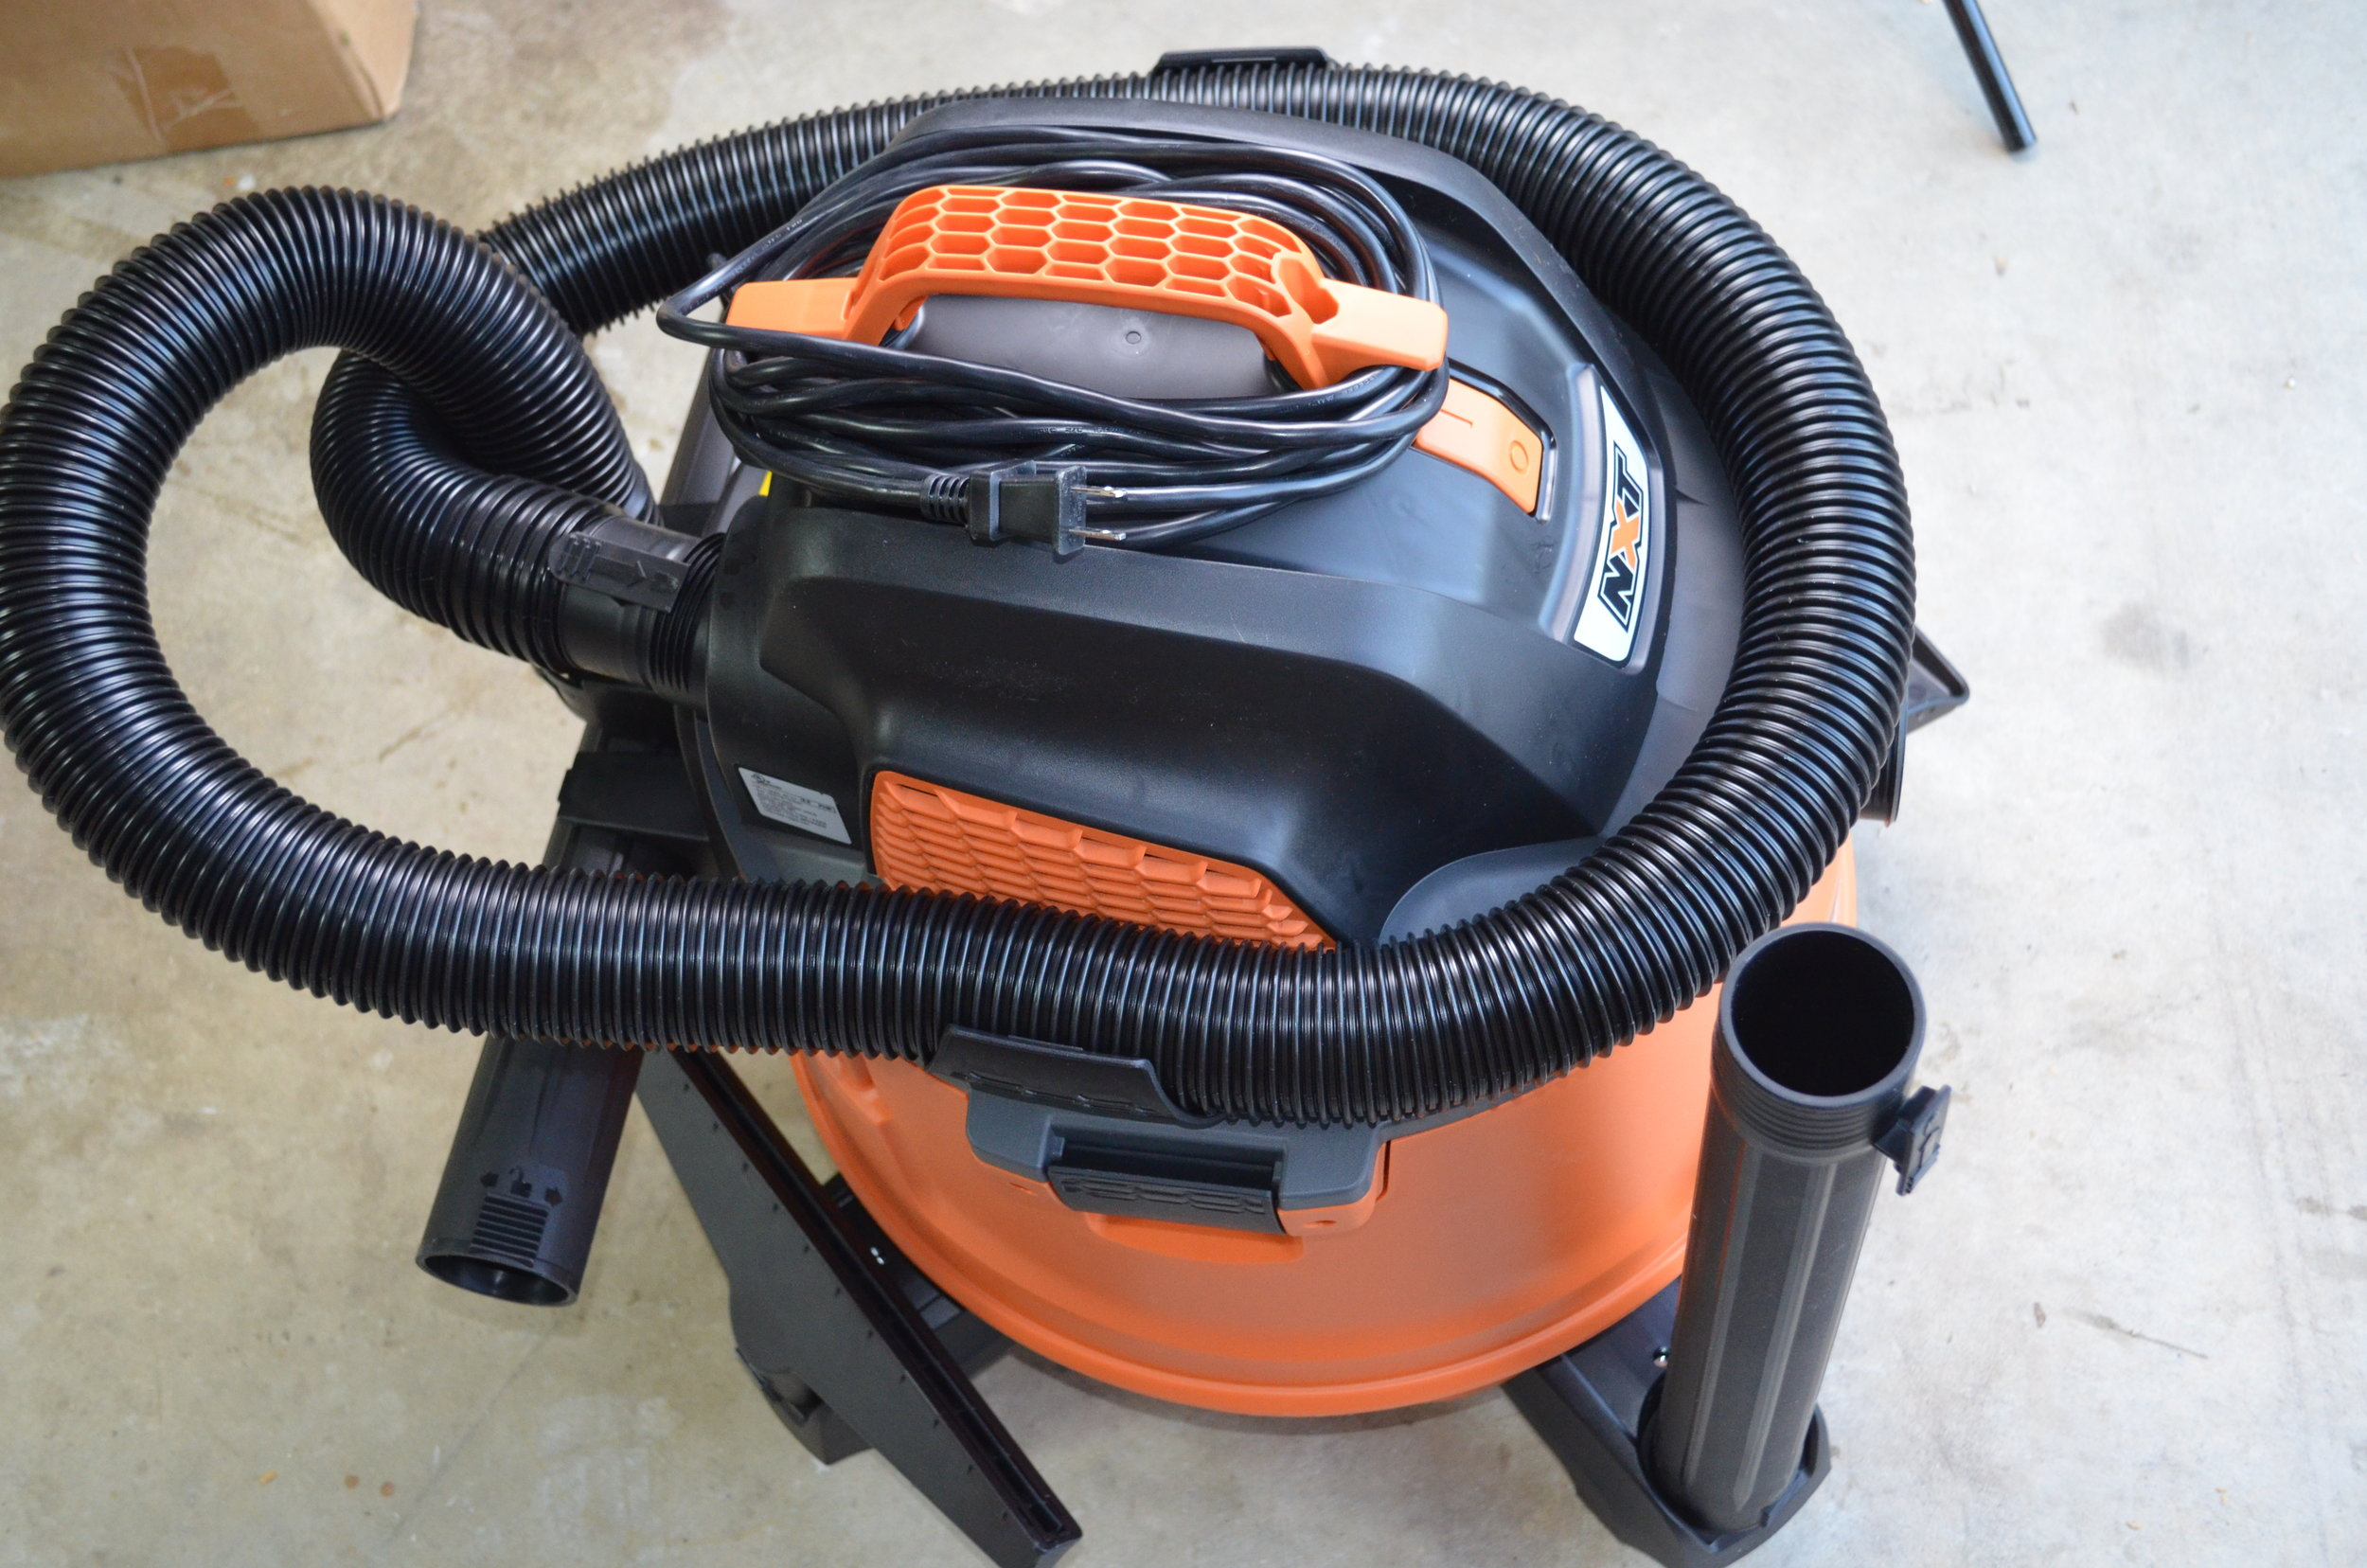 ridgid-nxt-dry-wet-vac-6hp-14gal-vacuum